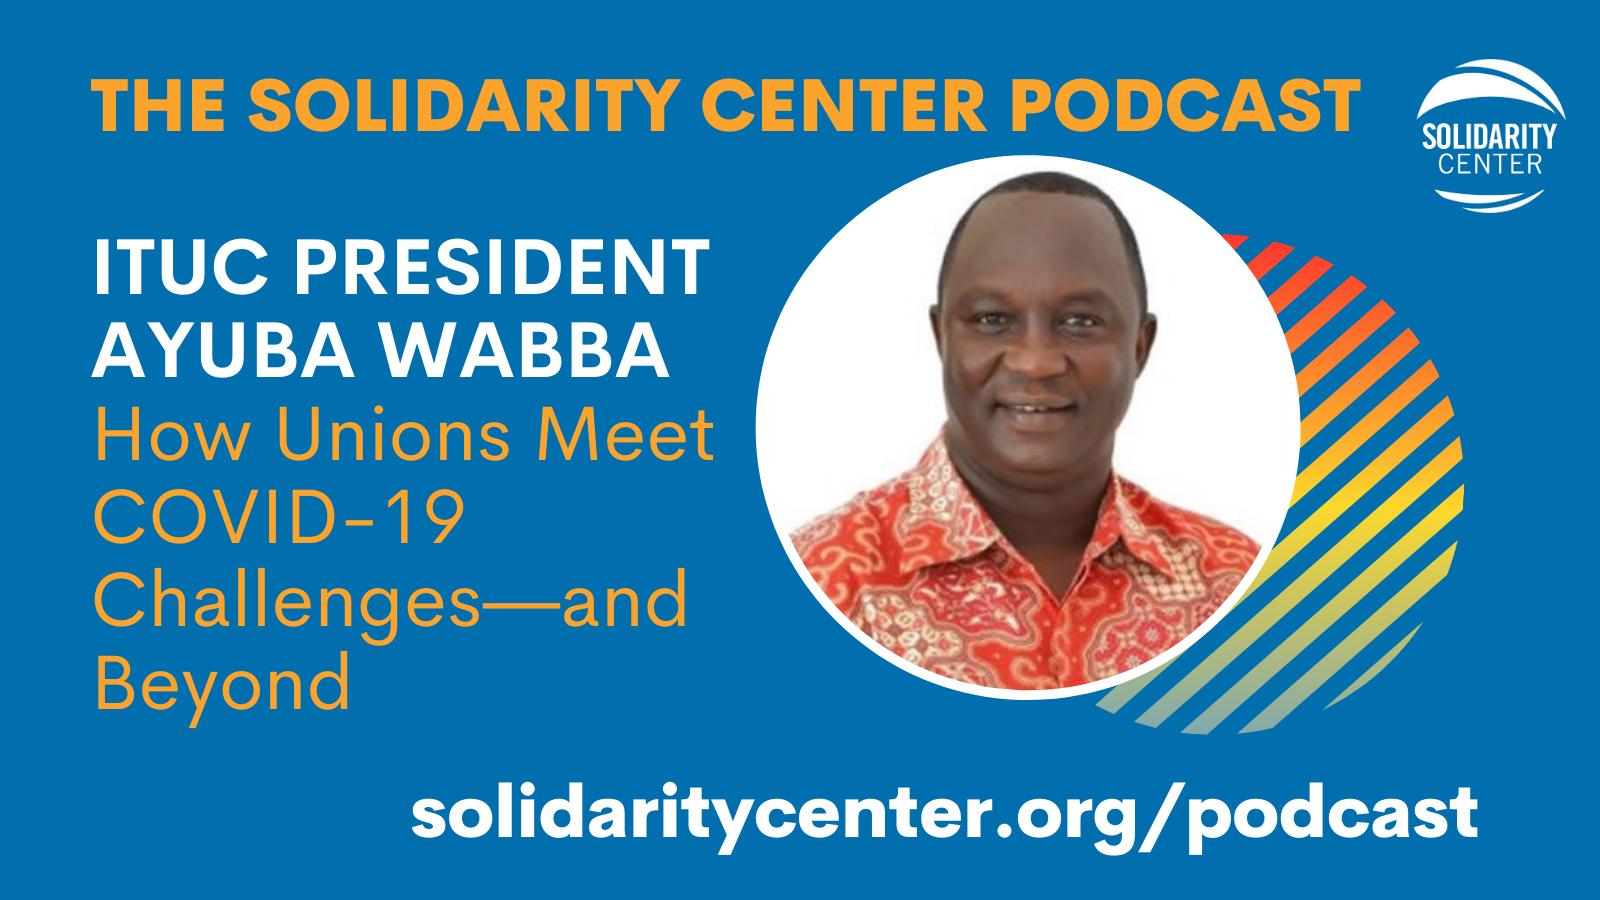 ITUC President Ayuba Wabba, Nigeria, COVID-19, unions, social protection, Solidarity Center